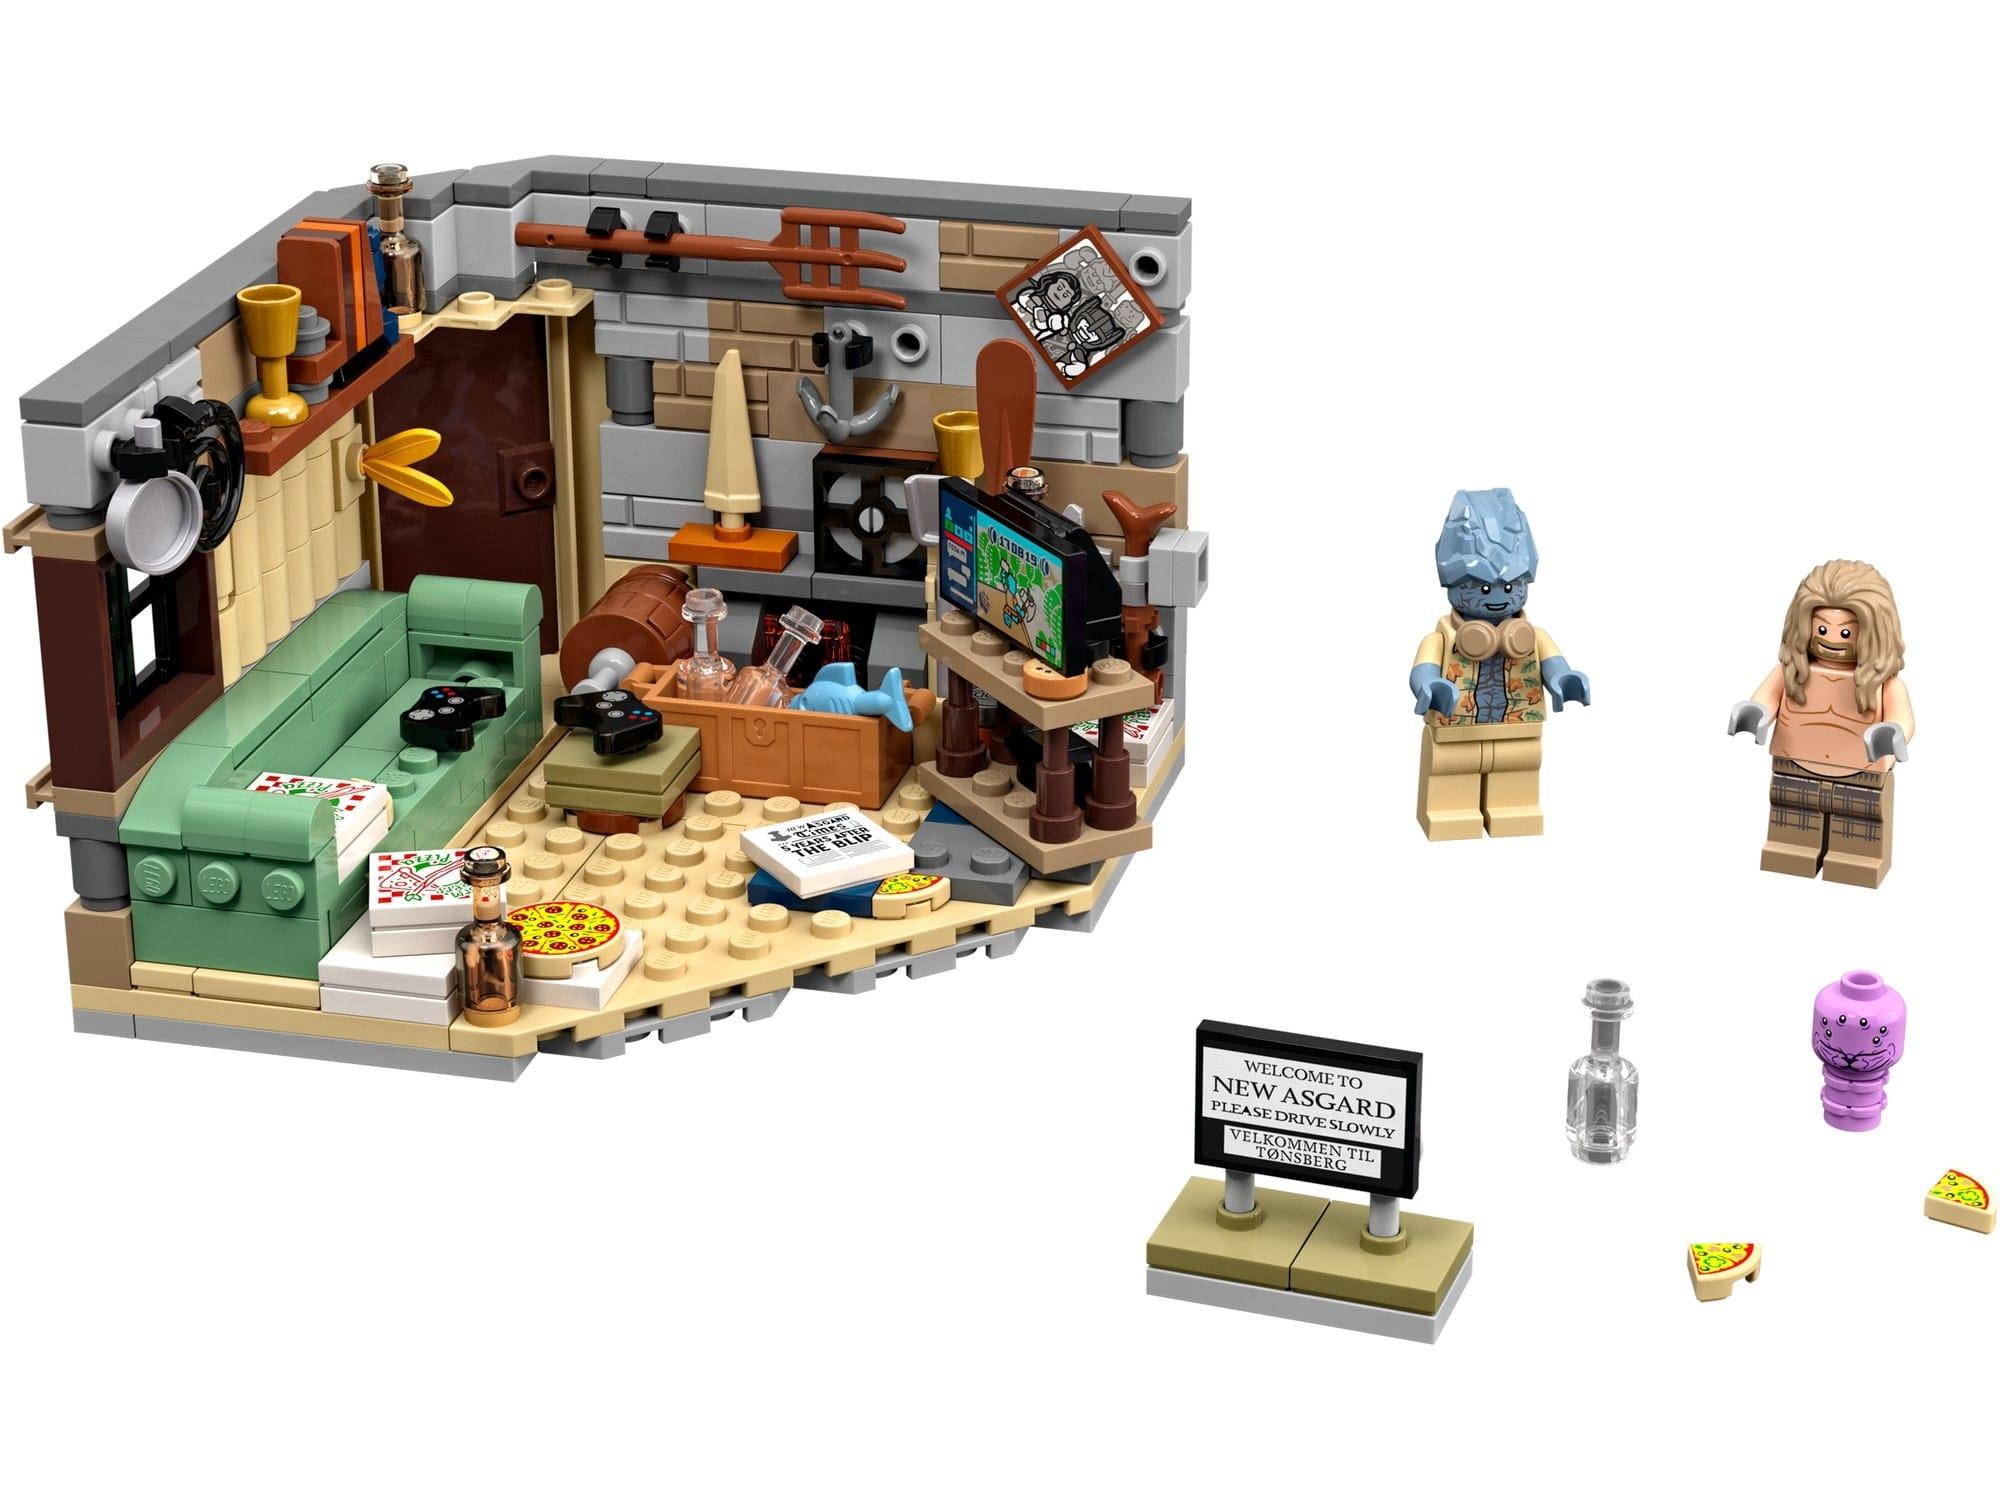 LEGO Marvel 76200 Bro Thor's New Asgard 1